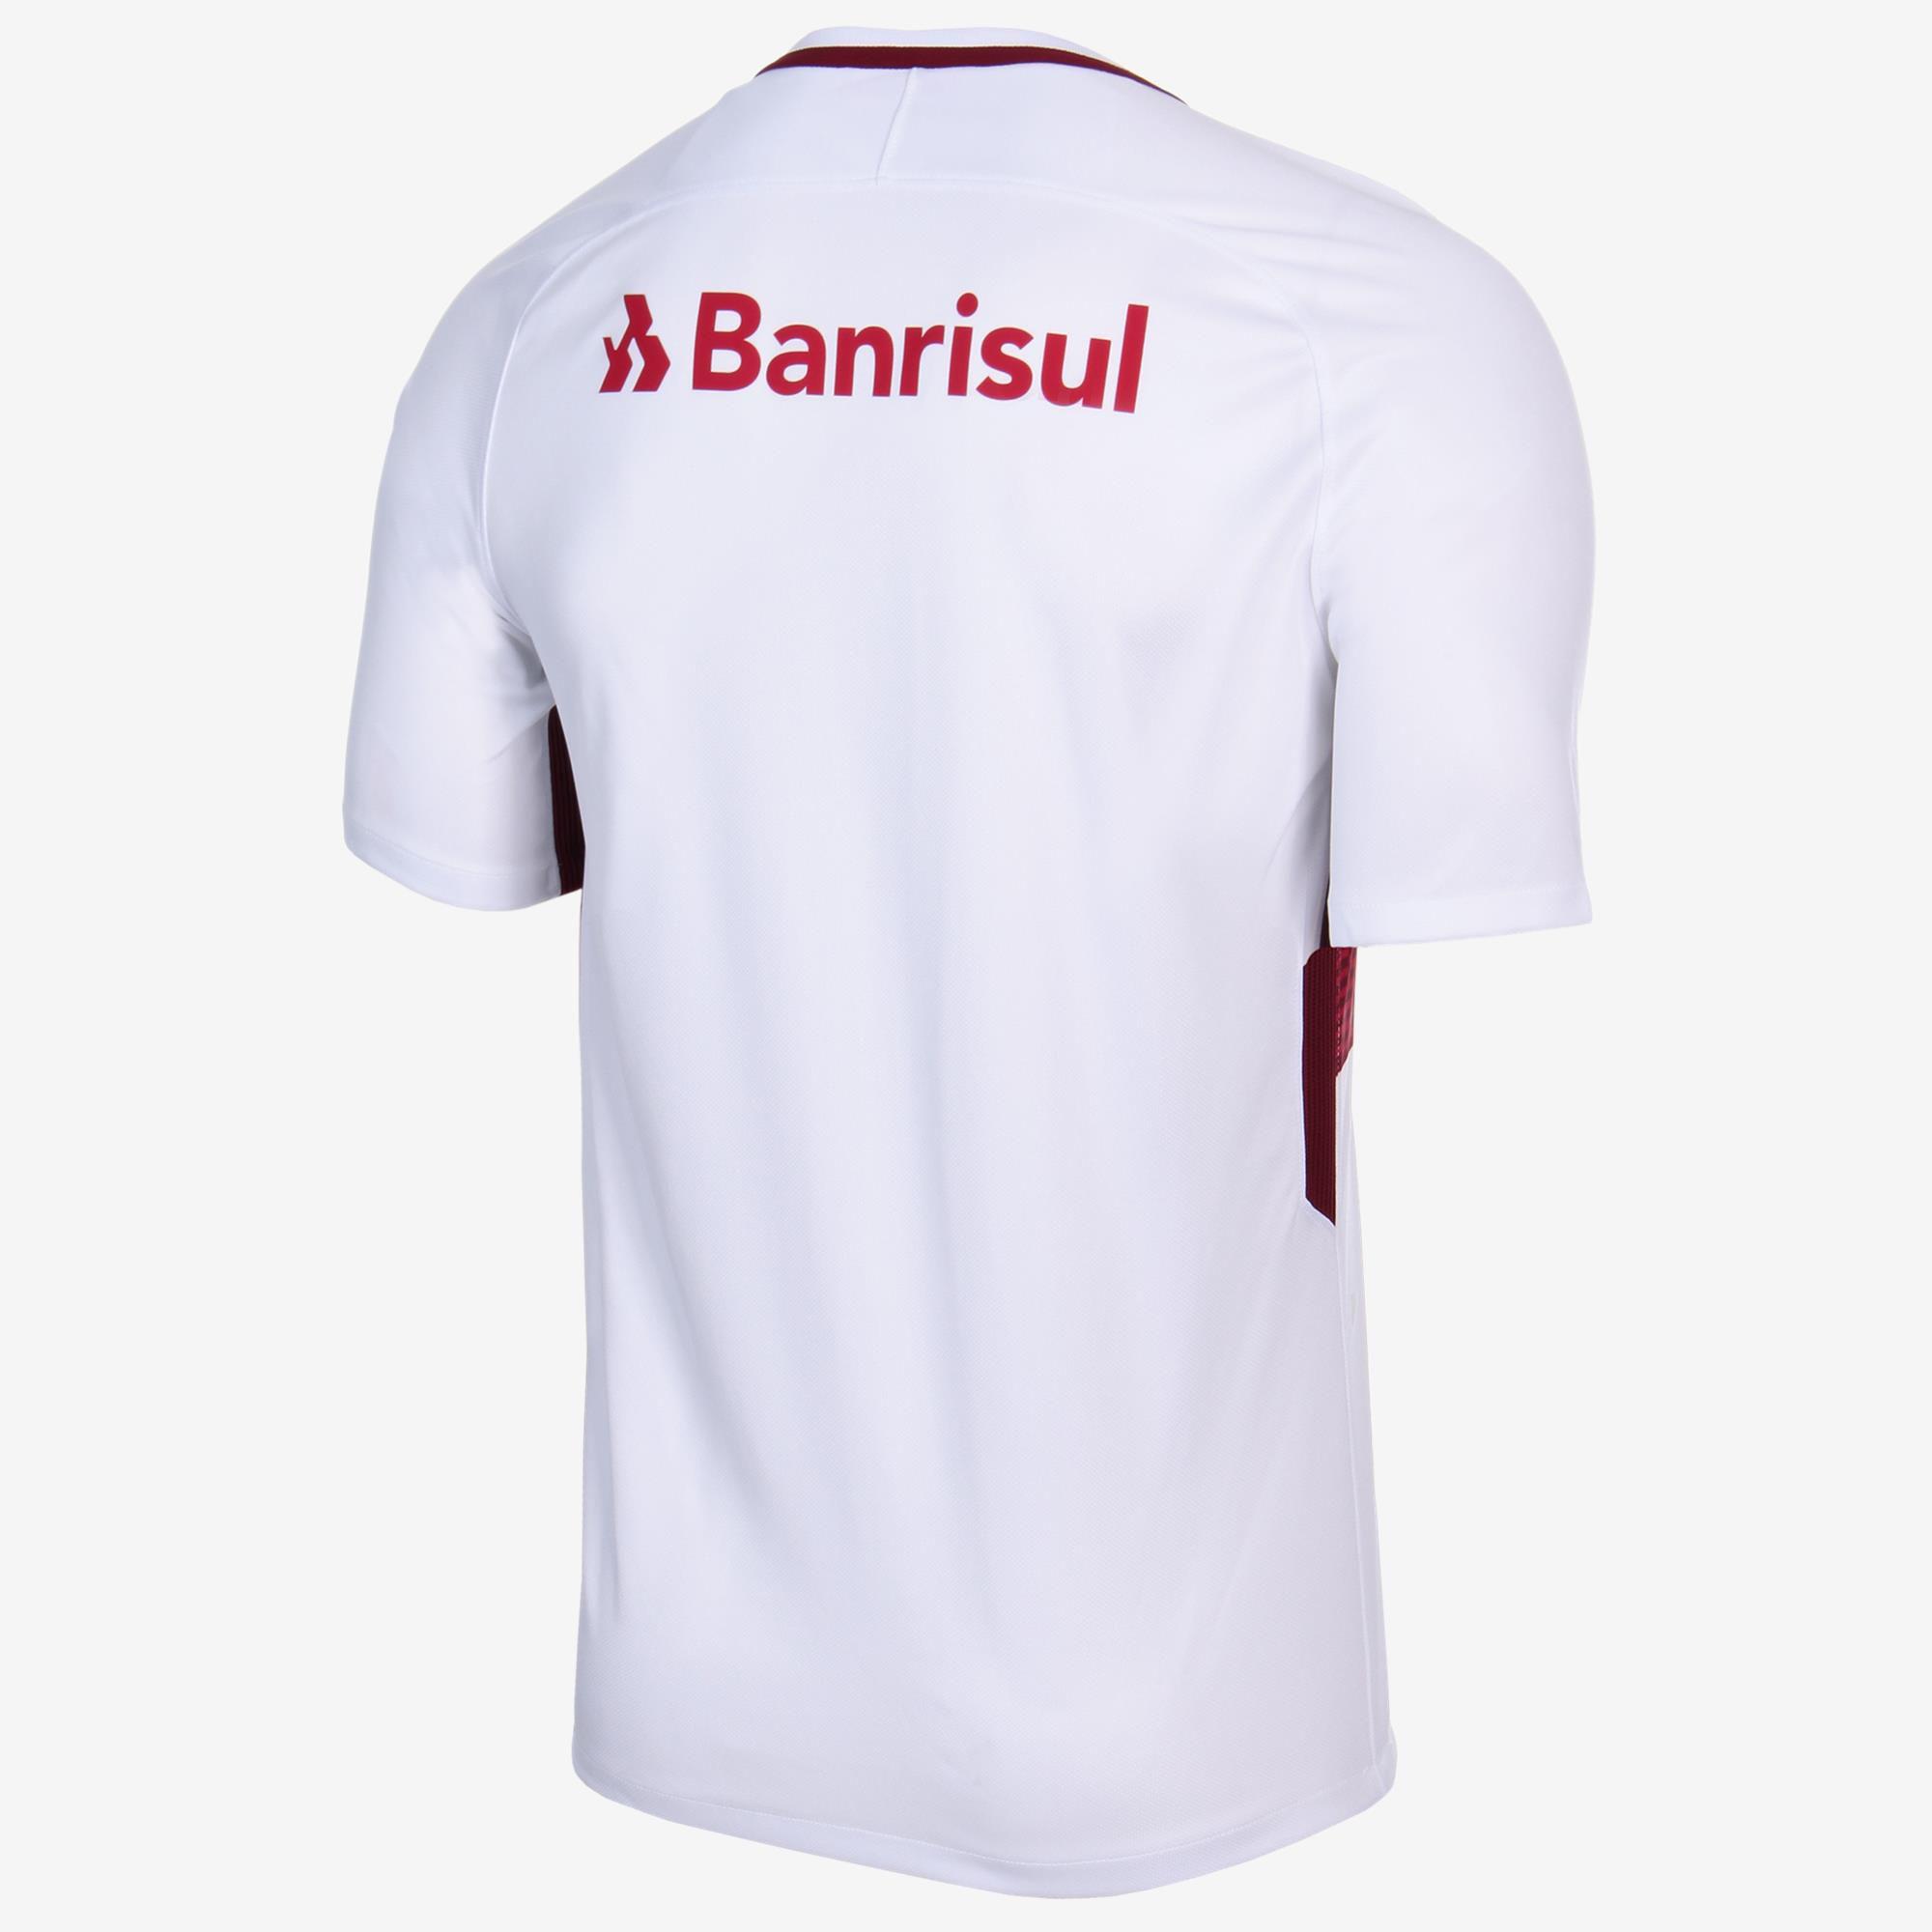 1750b05c54 Camisa Nike Internacional Ii 17 18 S n° Torcedor - BRACIA SHOP  Loja ...